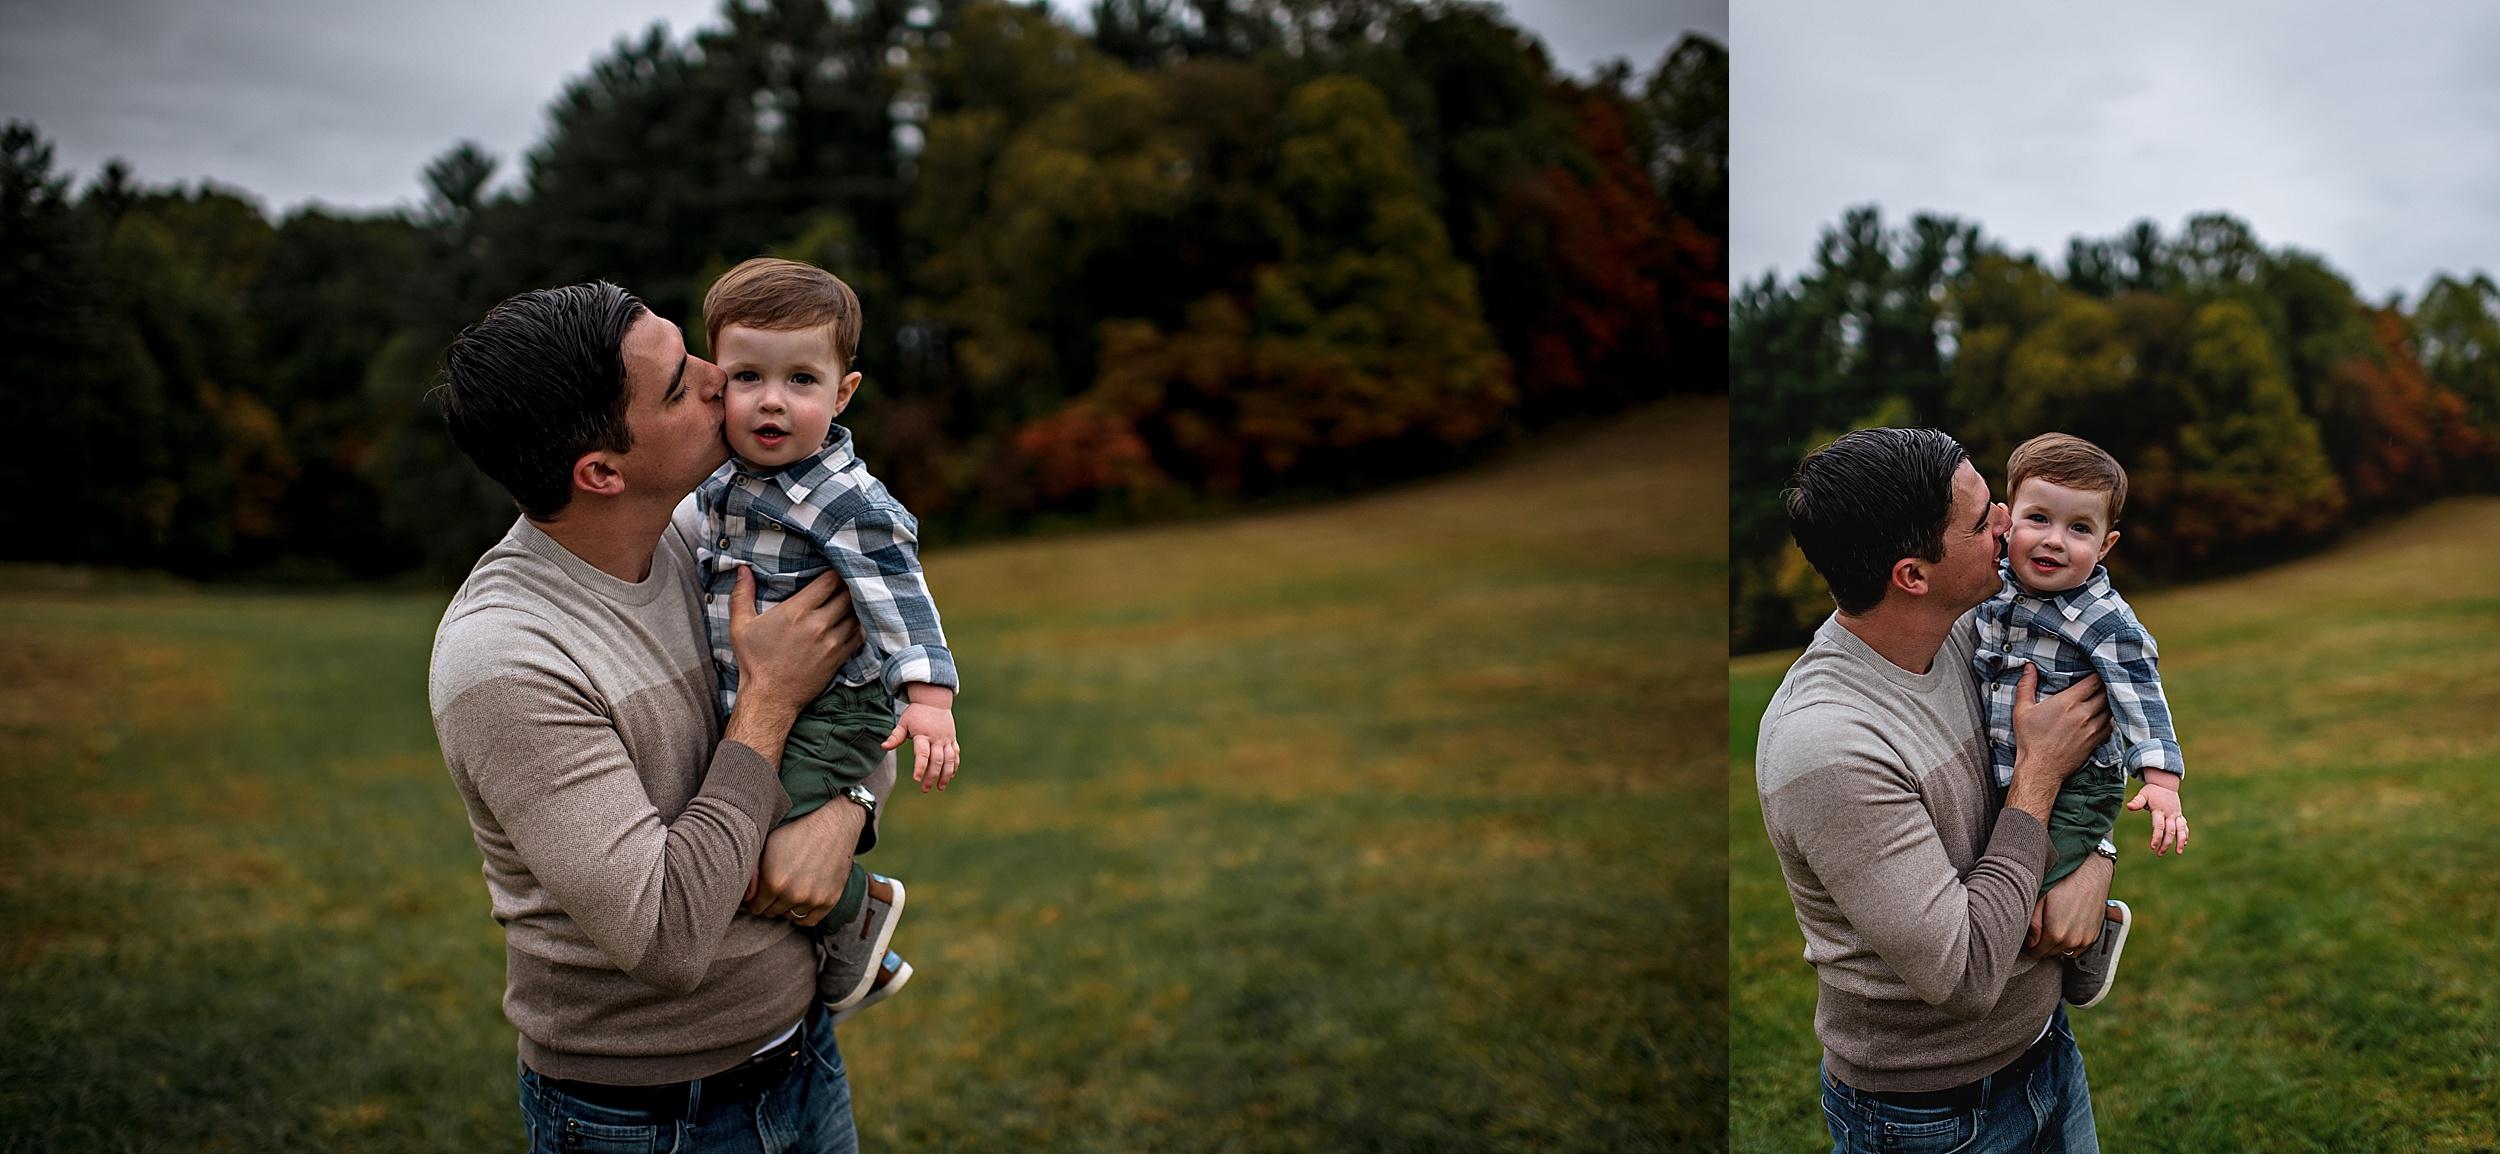 lauren-grayson-photography-portrait-artist-akron-cleveland-ohio-photographer-family-session-fields-sunset-fall_0203.jpg